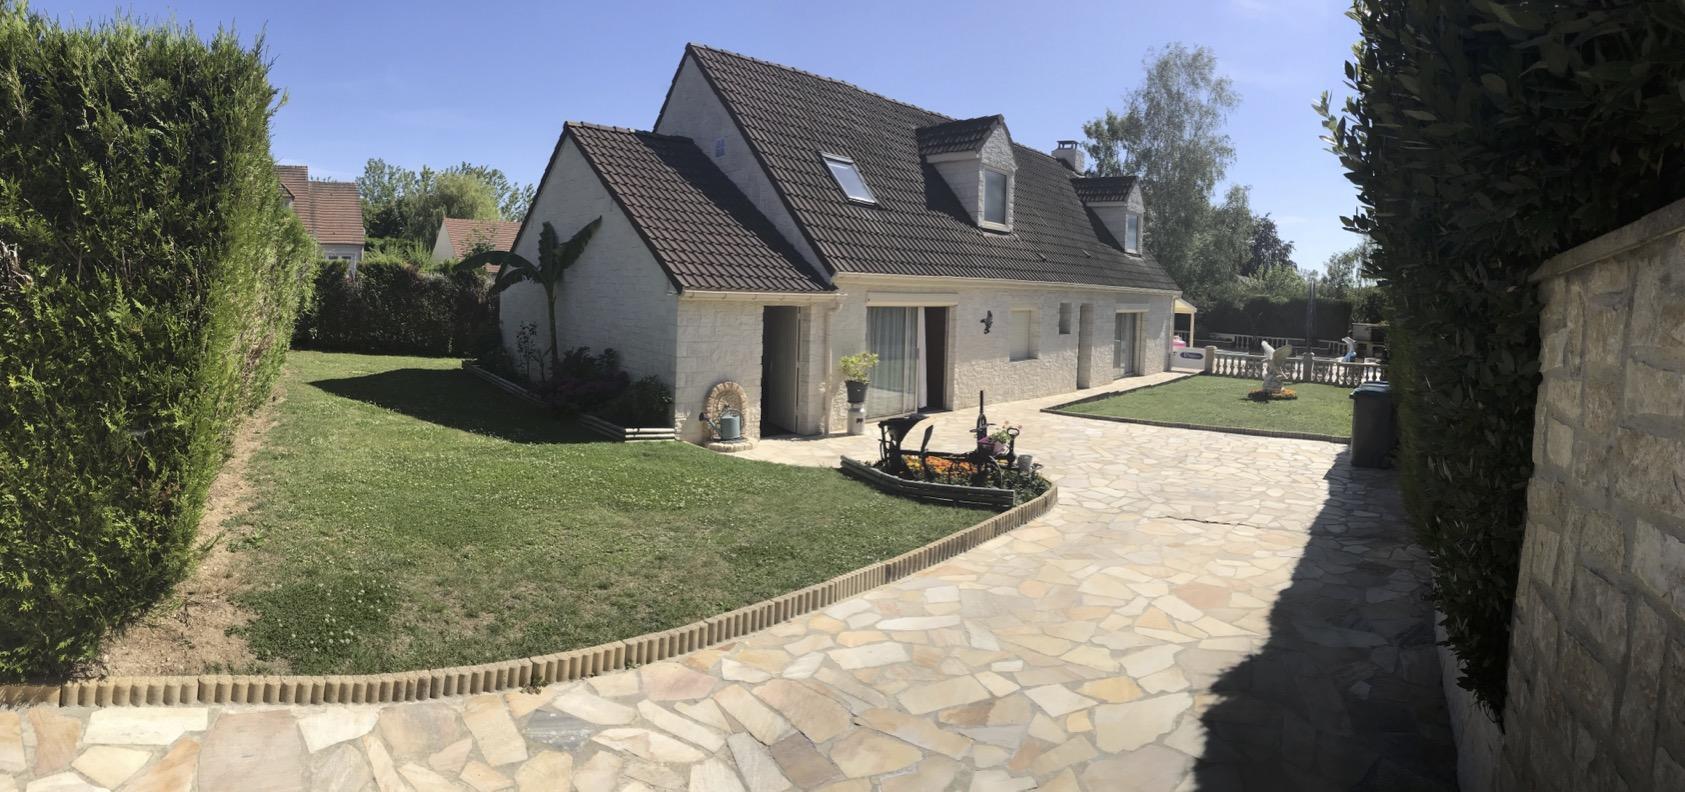 Maison avec piscine Perigny Grand Paris